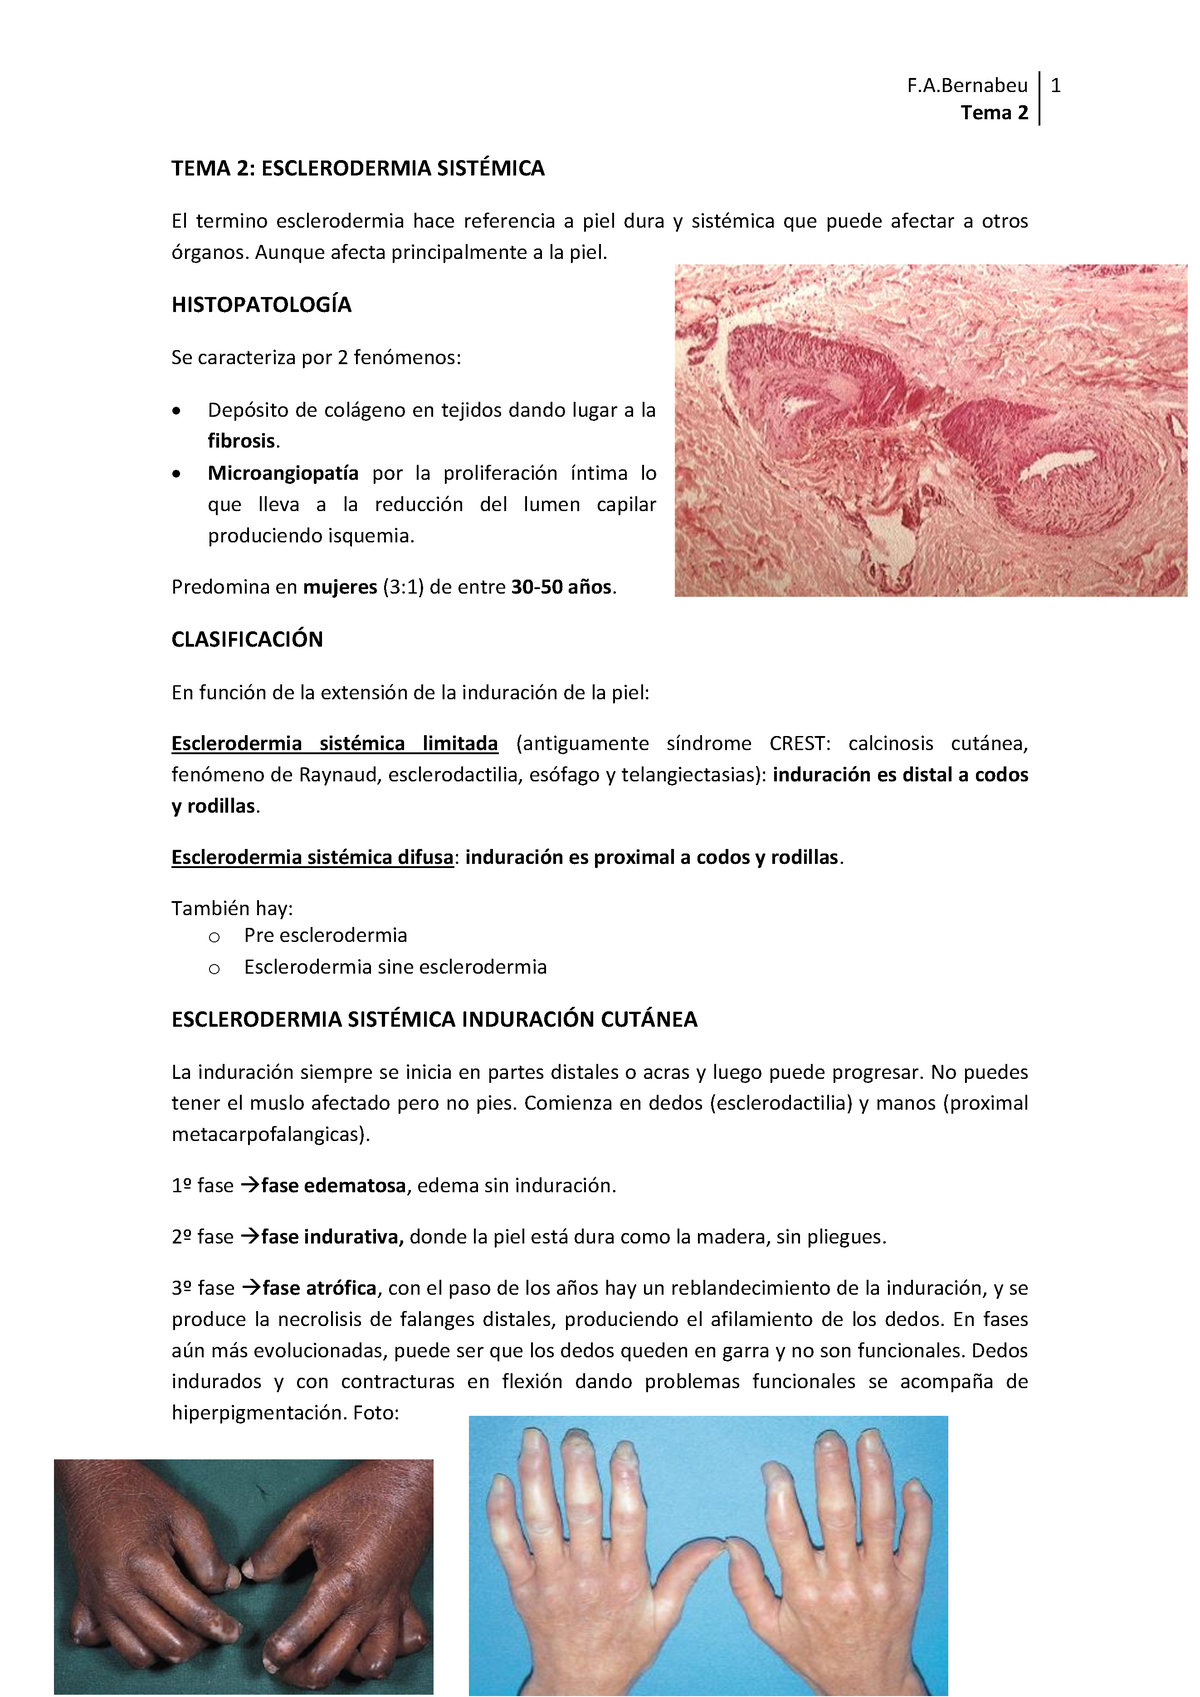 esclerodermia limitada